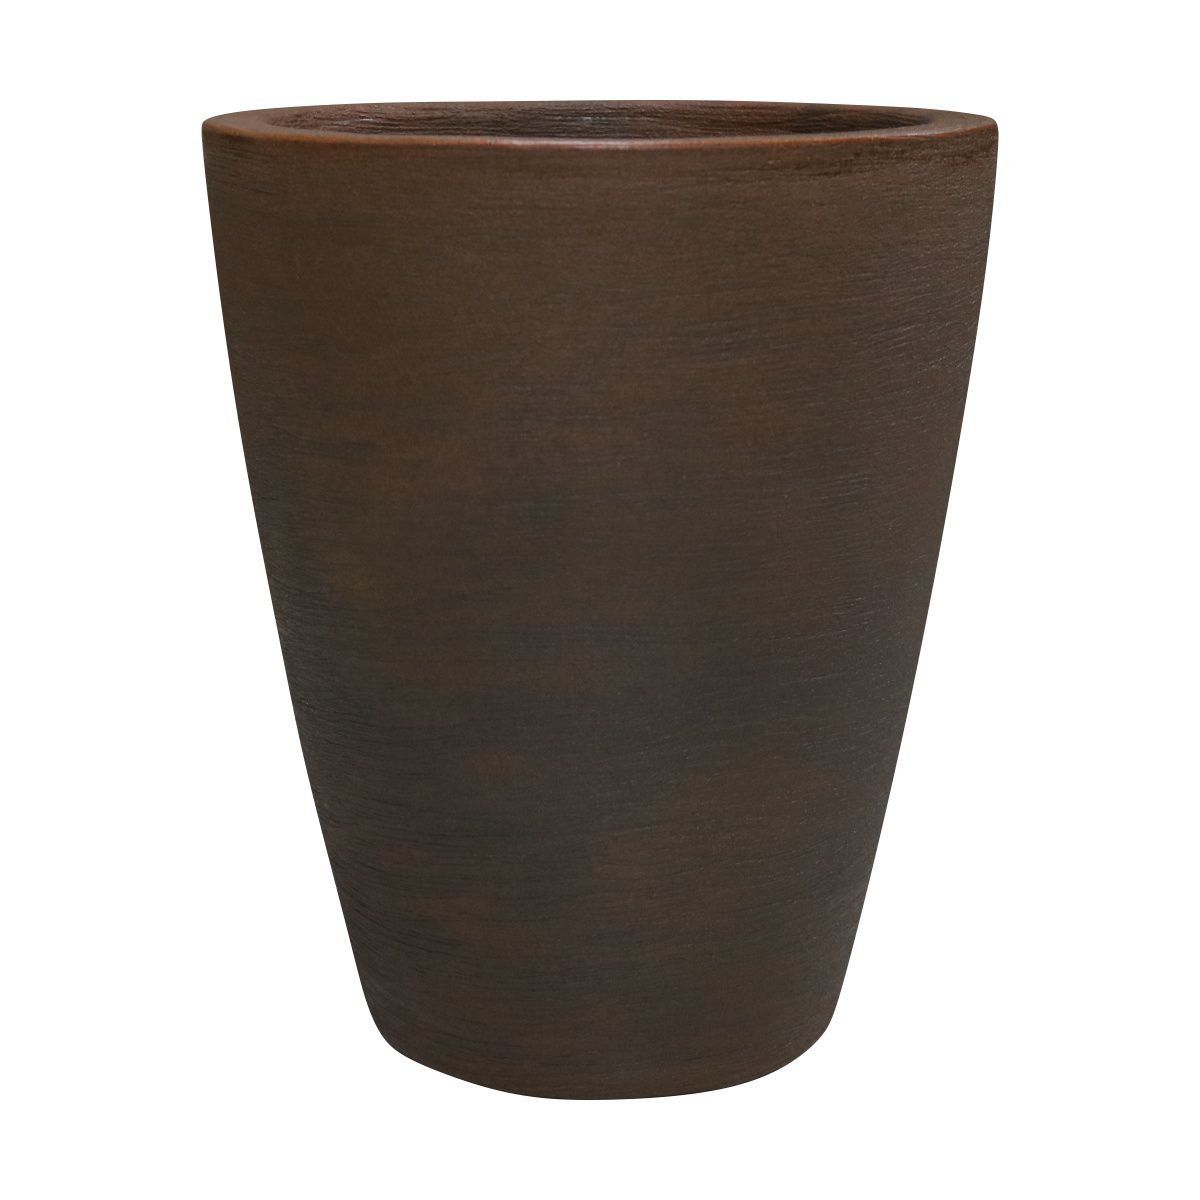 Vaso Cone Riscatto Vogue cor Ferrugem 30,5cm x 24,5cm - RCP0-FE